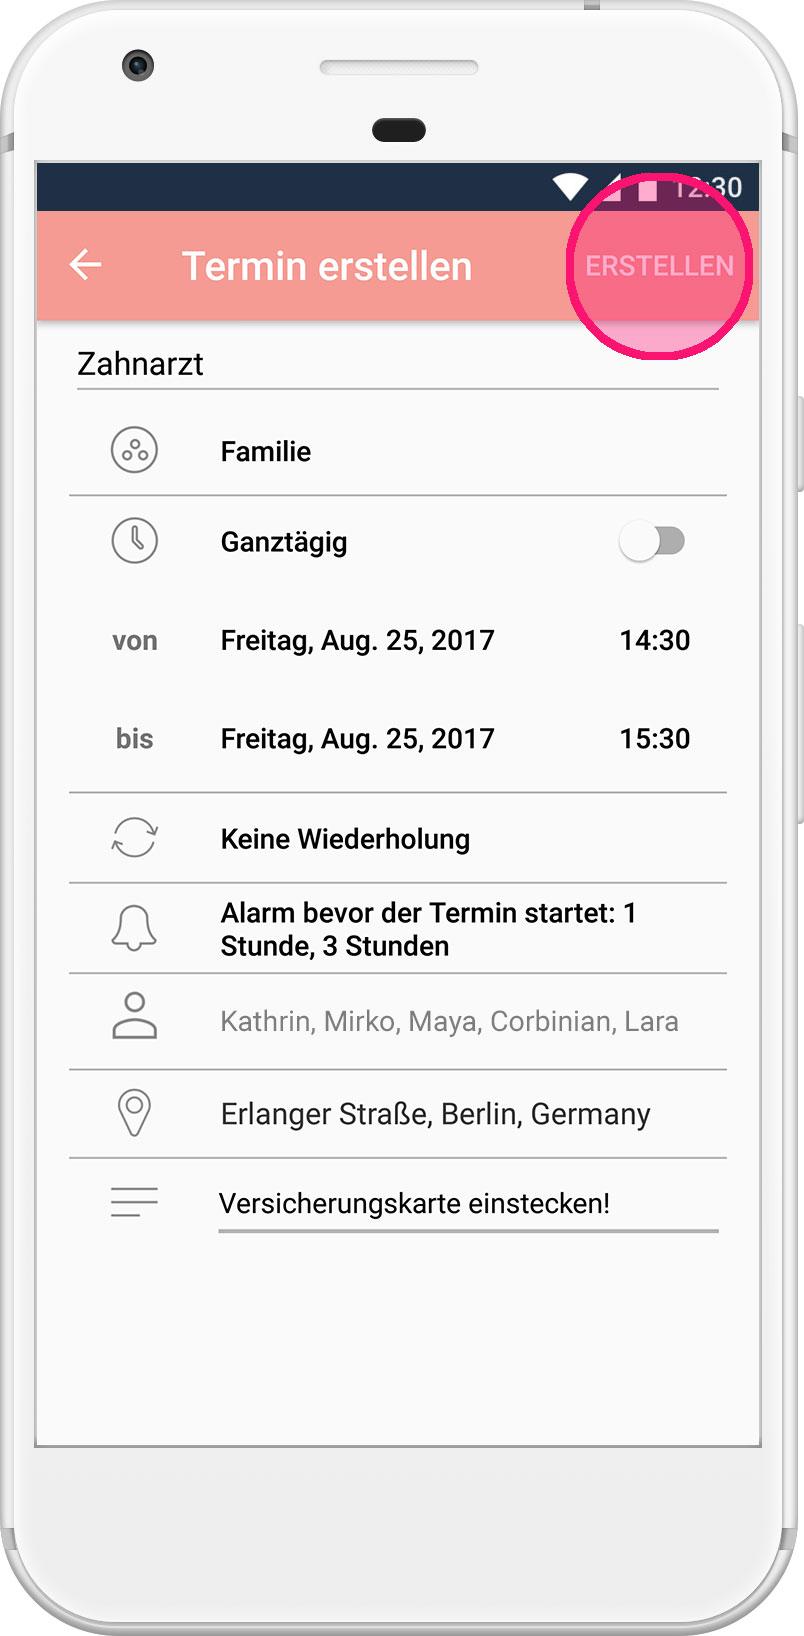 looping_app_tutorial_android_gruppentermin-erstellen